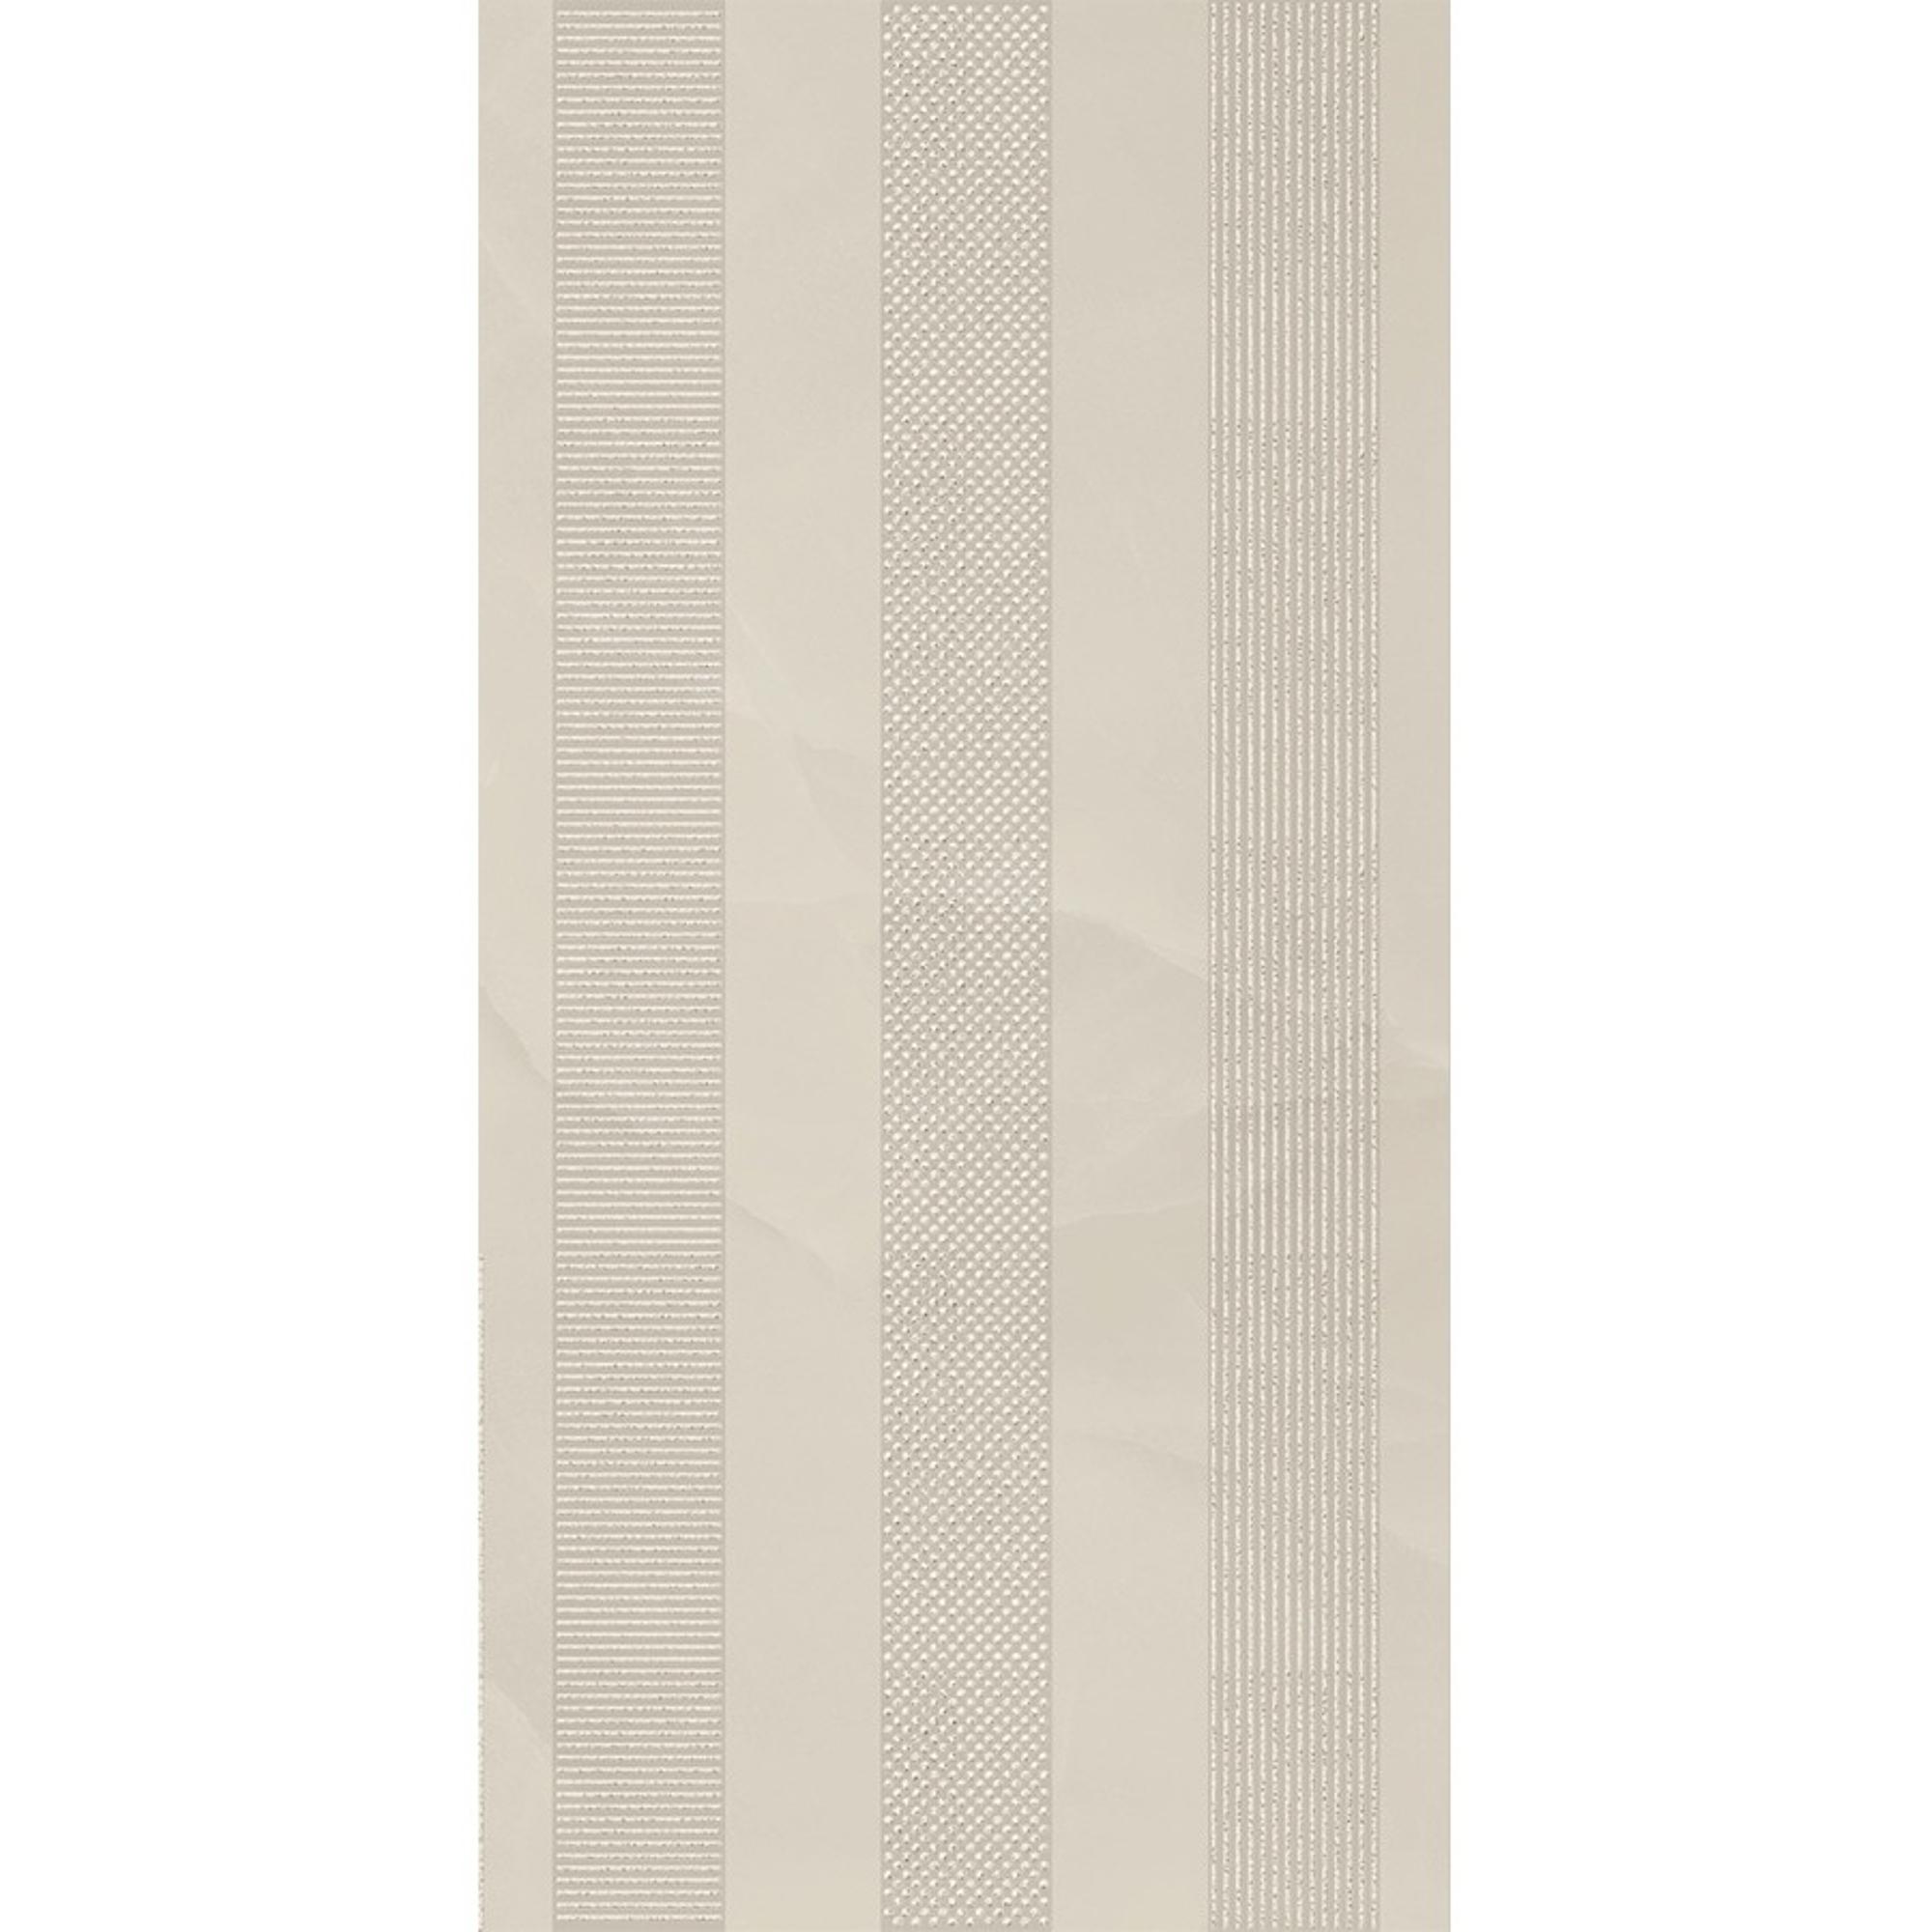 Декор Керлайф Classico Onice Gris 2 1c 31.5*63 см настенная плитка kerlife stella blu 1c 31 5x63